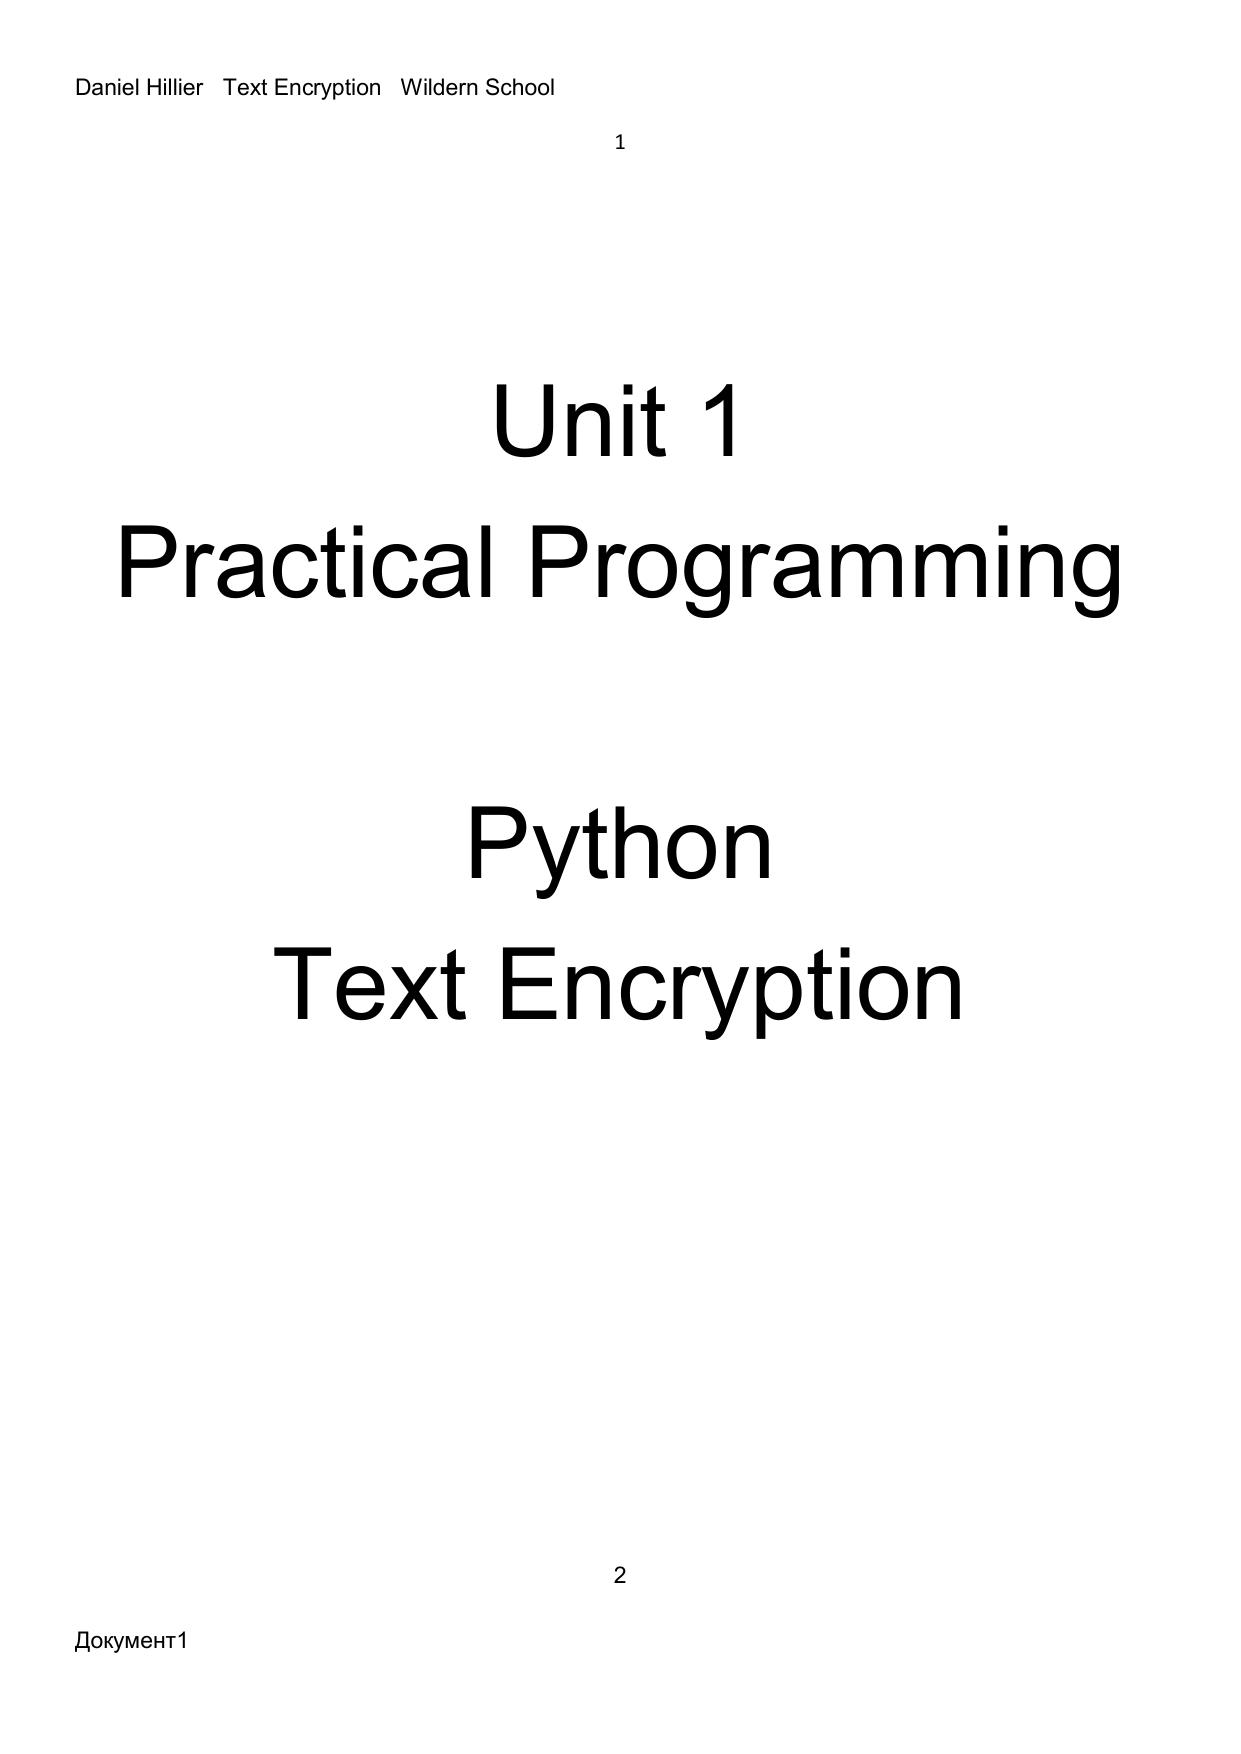 Hillier_Daniel_58243_3522_TextEncryption New